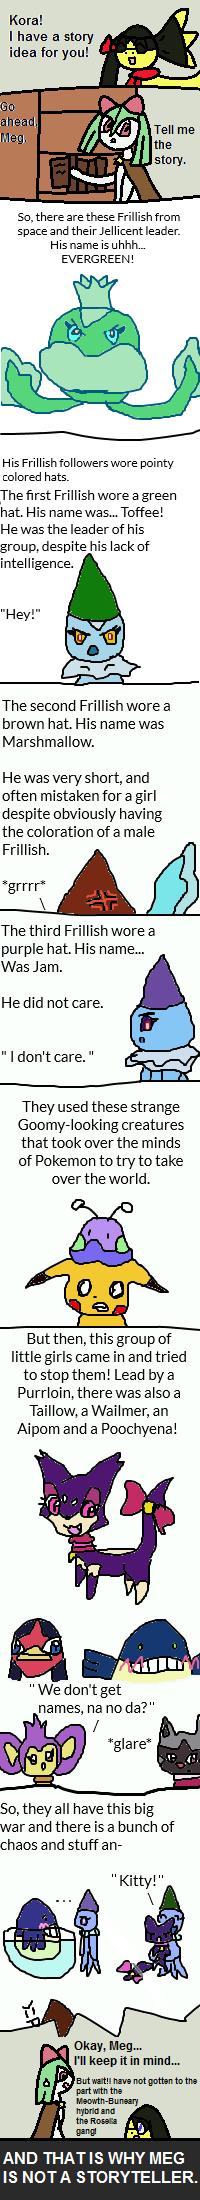 Why Meg isn't a storyteller. by PlatyGalK